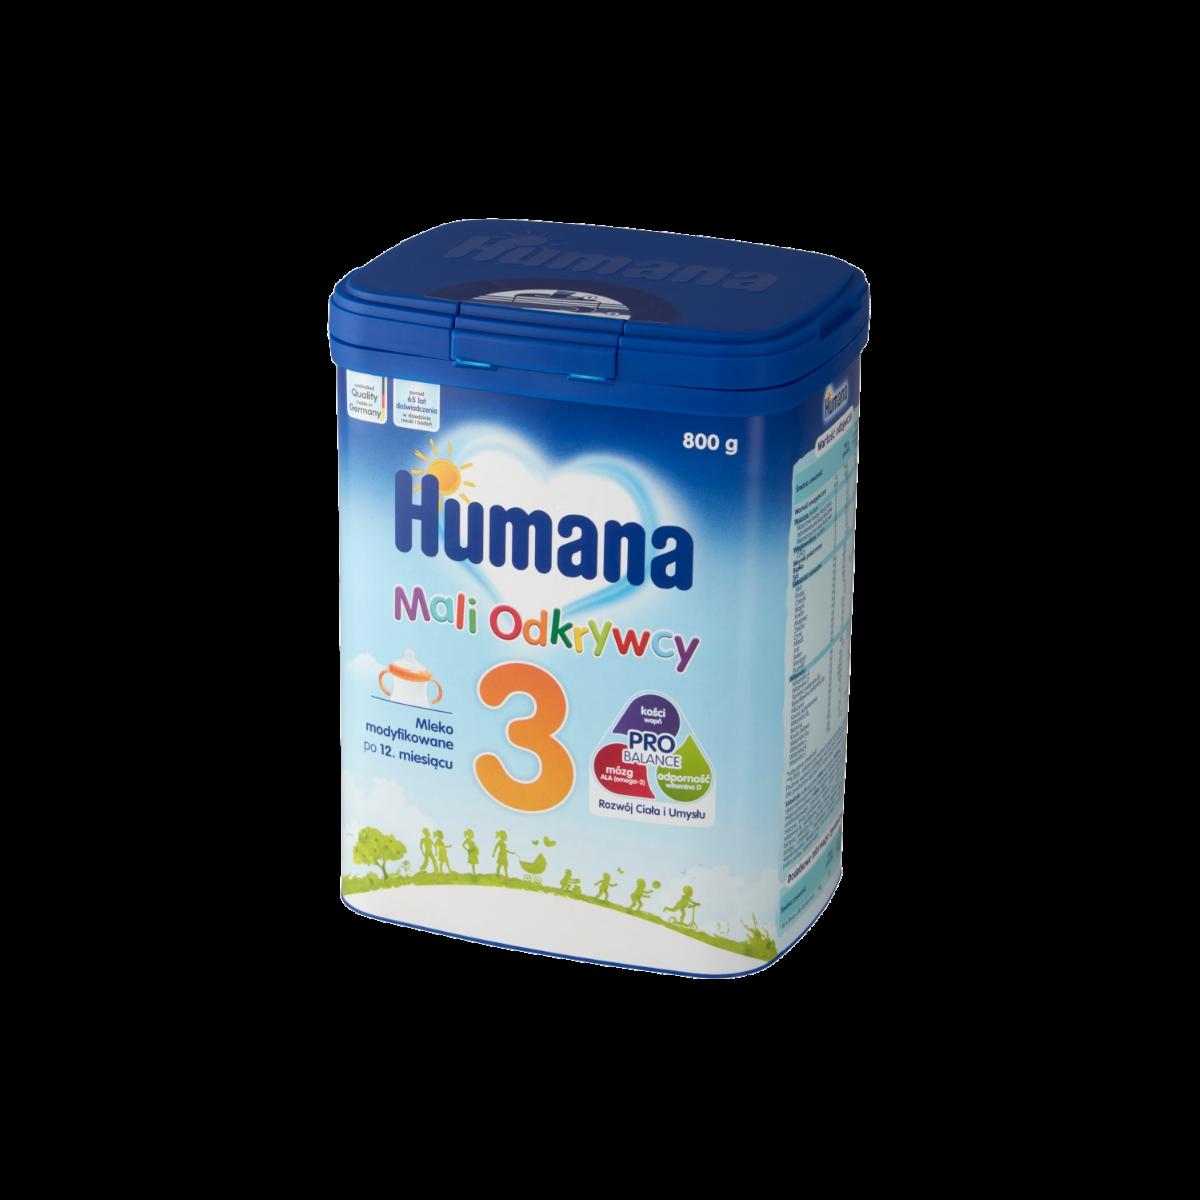 humana_3_800g